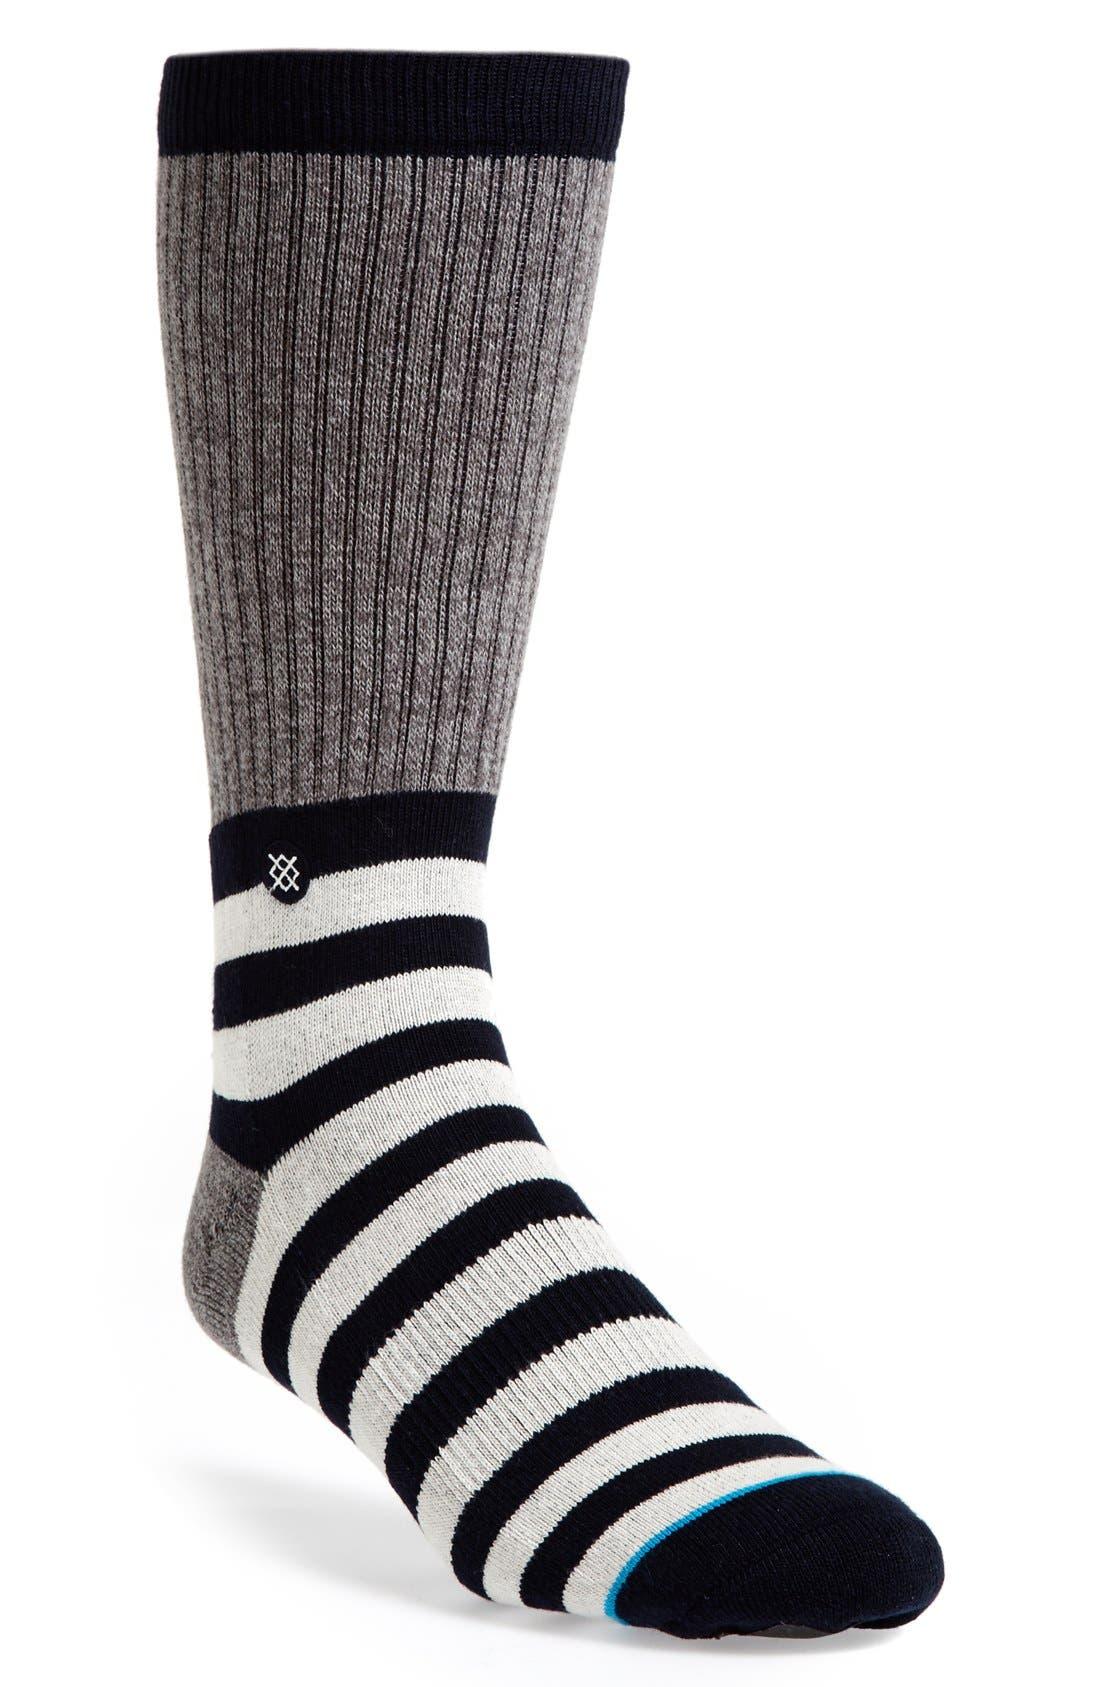 Alternate Image 1 Selected - Stance 'Shoreman' Socks